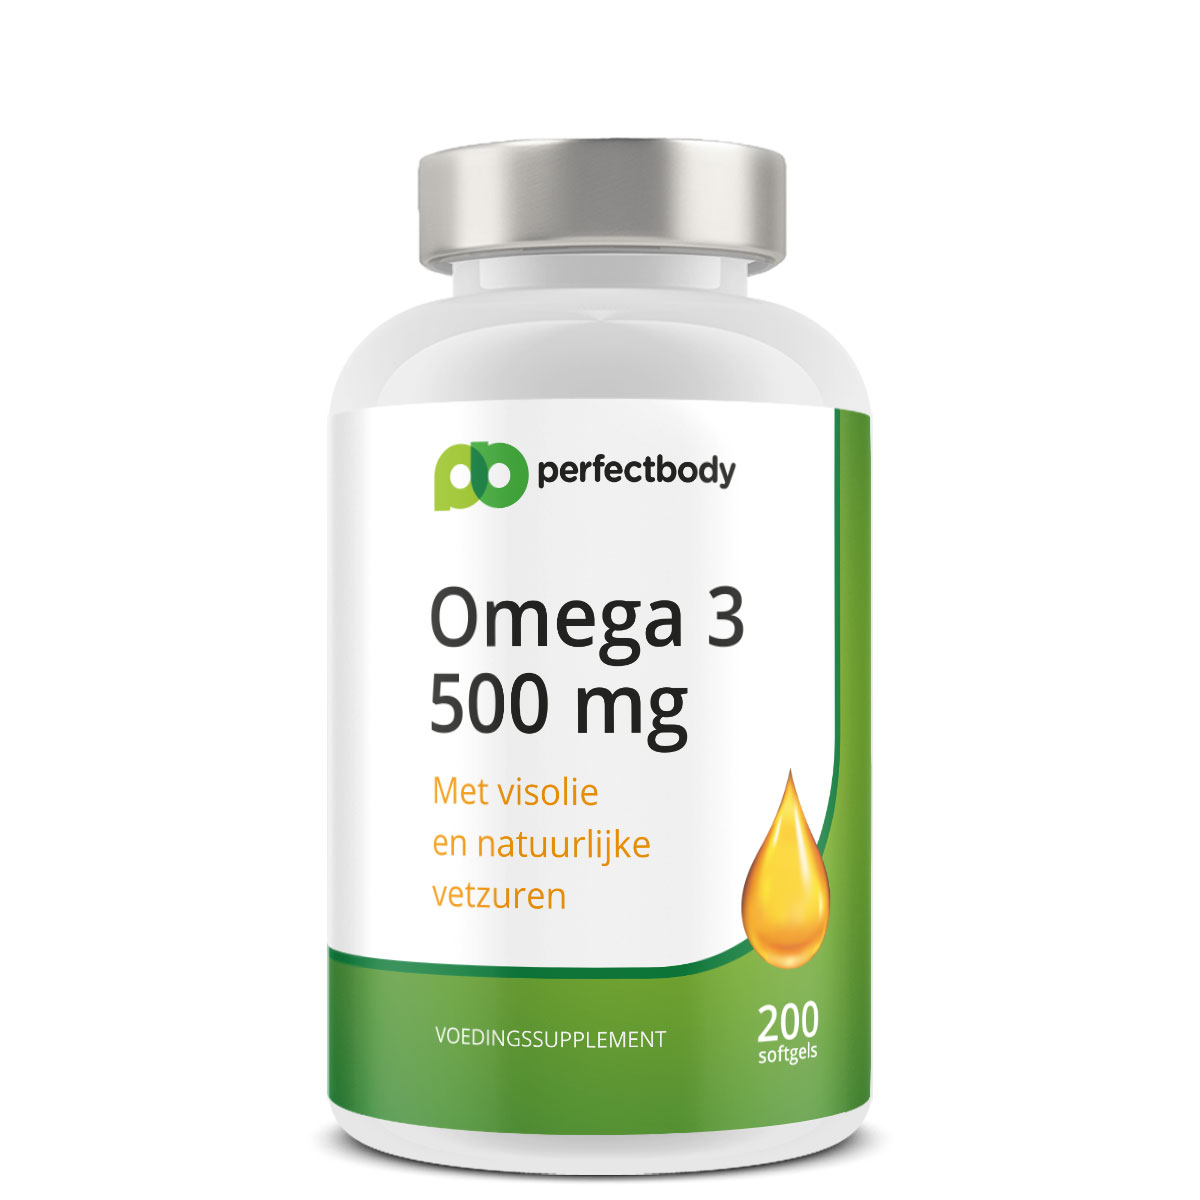 Perfectbody Omega 3 Capsules (500 Mg) - 200 Softgels